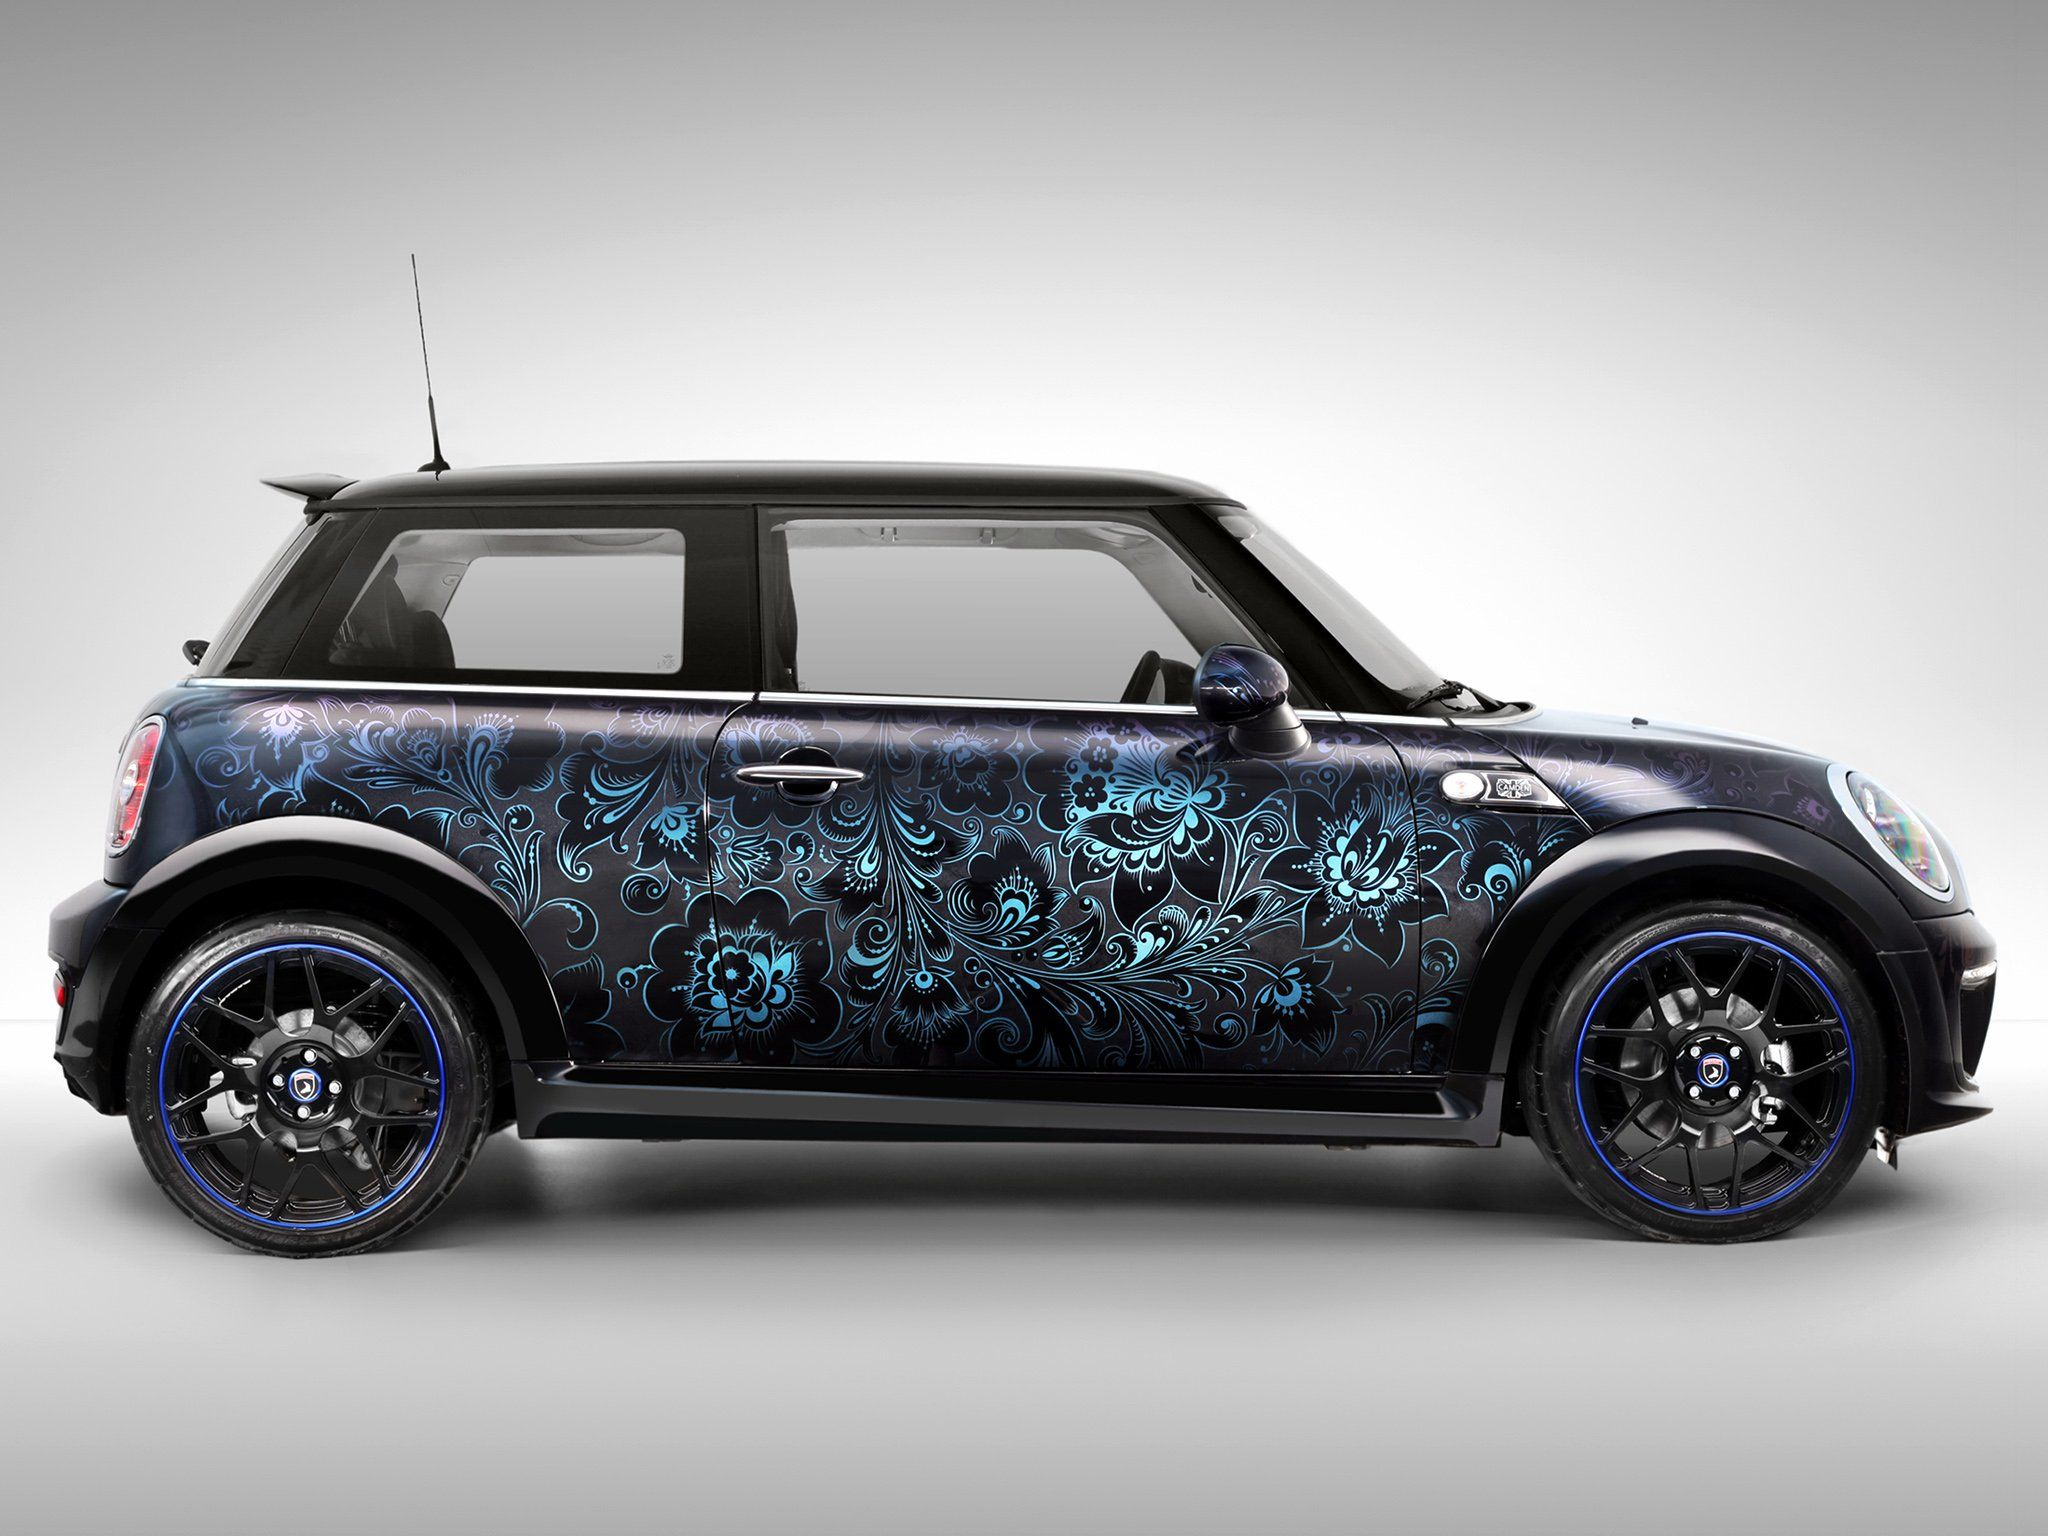 Photo of TopCar Mini Cooper-Sのいじめモスクワの車に改造された壁紙|2048×1536|723181|…